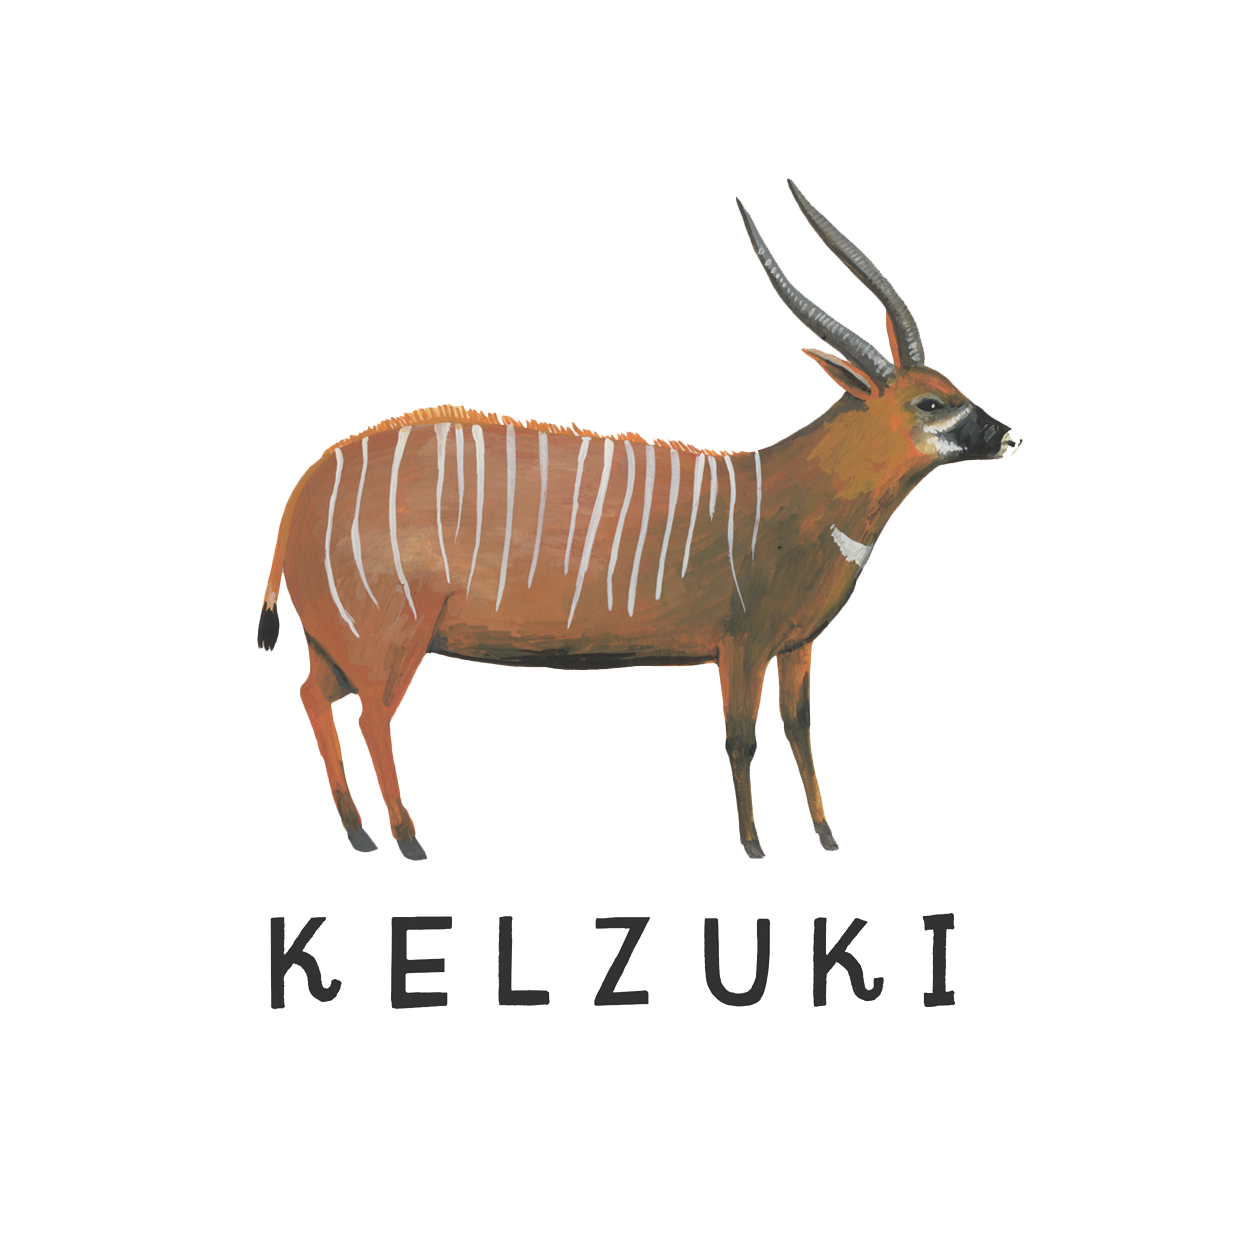 Kelzuki Illustration Cool Drawings Unique Items Products